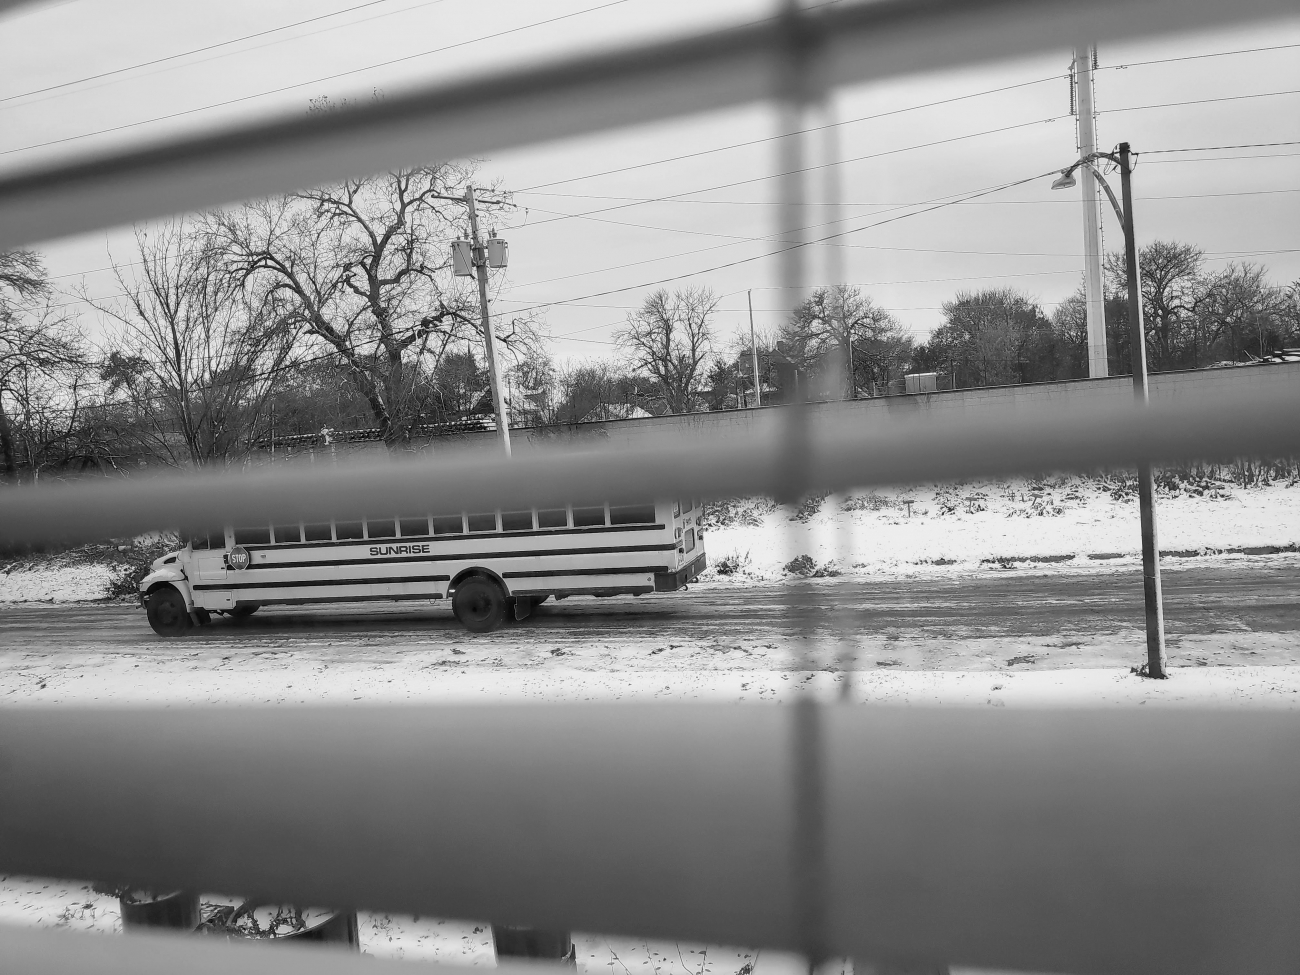 Un bus escolar recorre Englewood